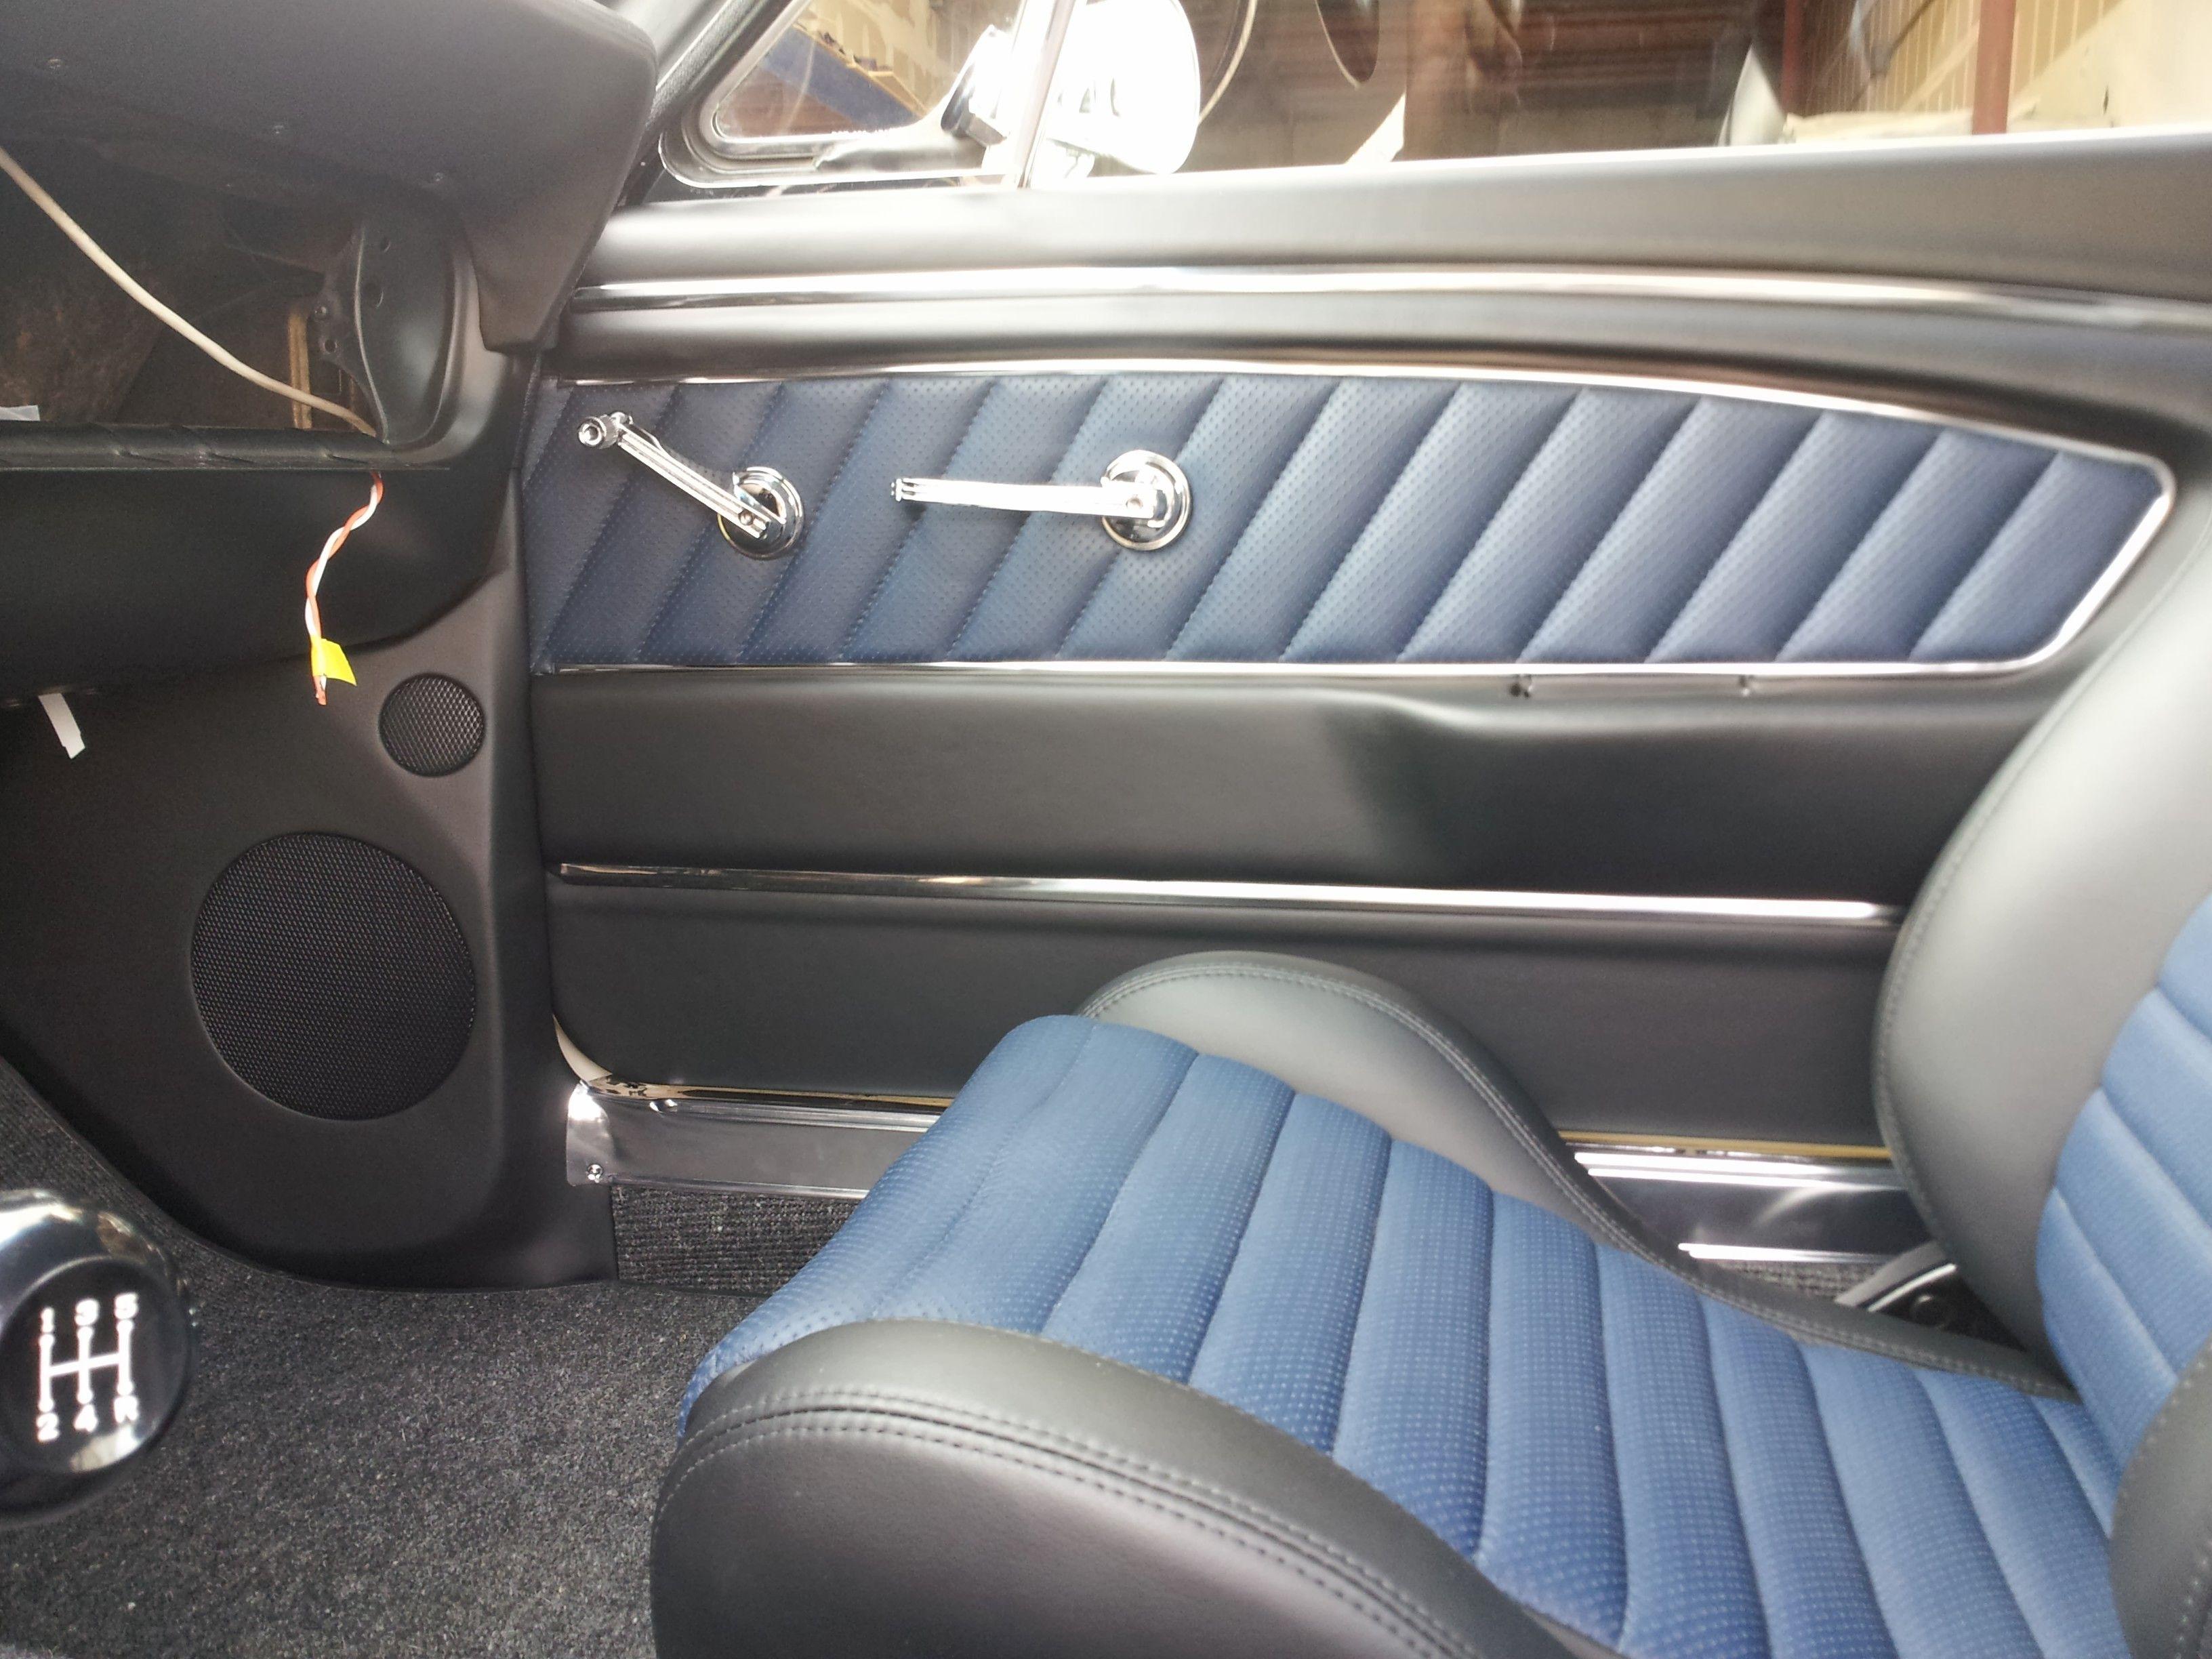 1966 Mustang Custom Interior Google Search Custom Car Interior Mustang Fastback Mustang Interior